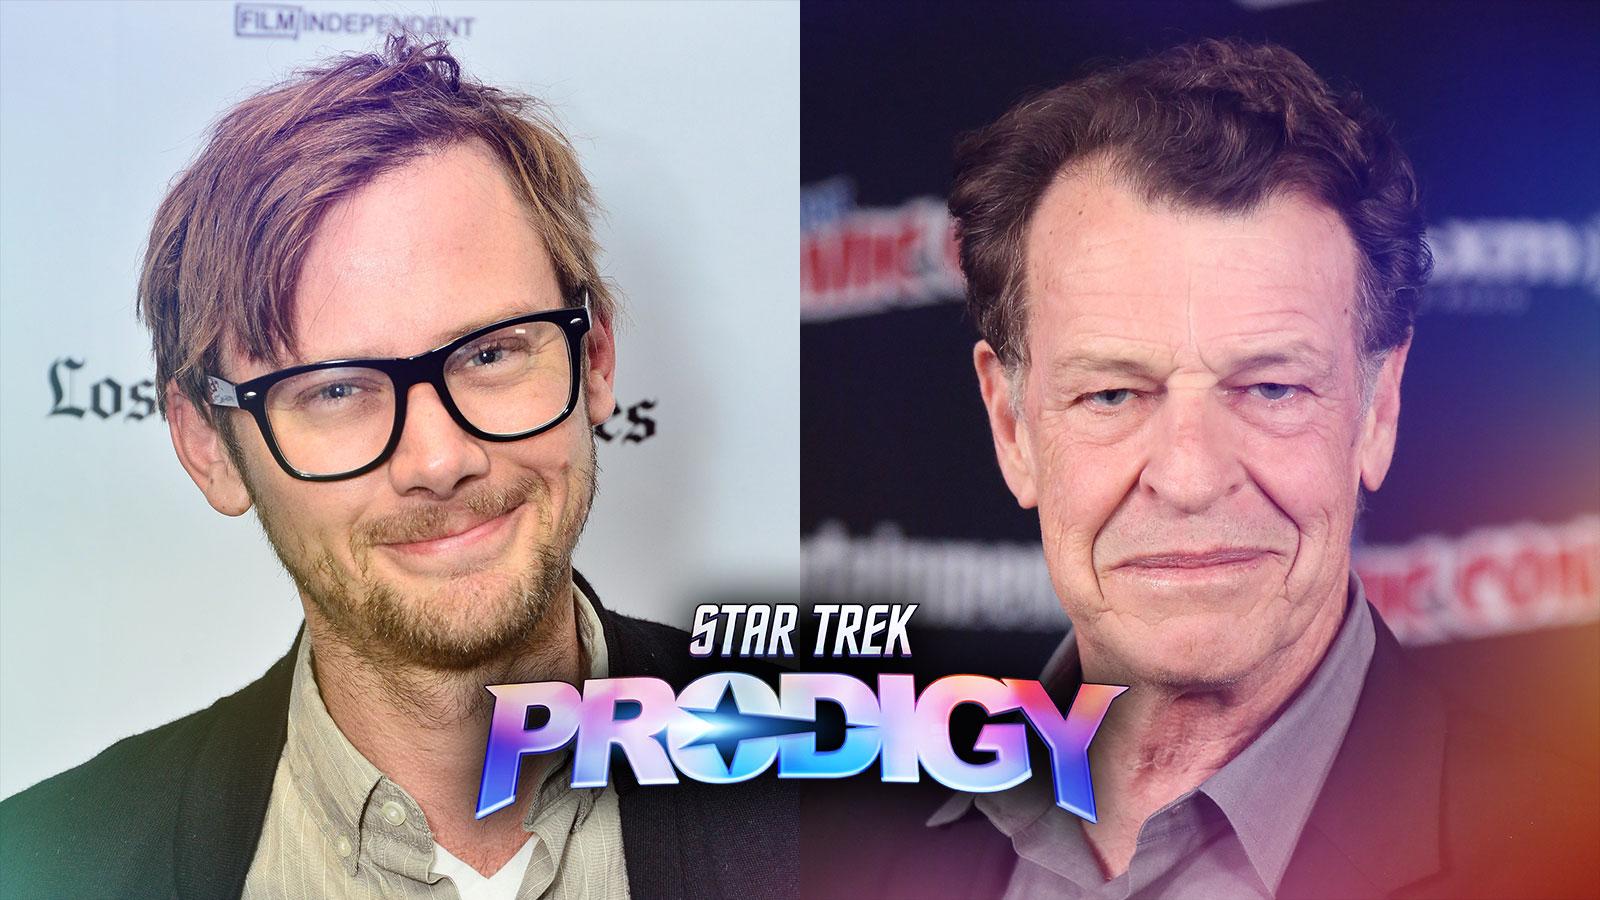 Star Trek: Prodigy Adds Sci-Fi Veterans Jimmi Simpson, John Noble To Cast